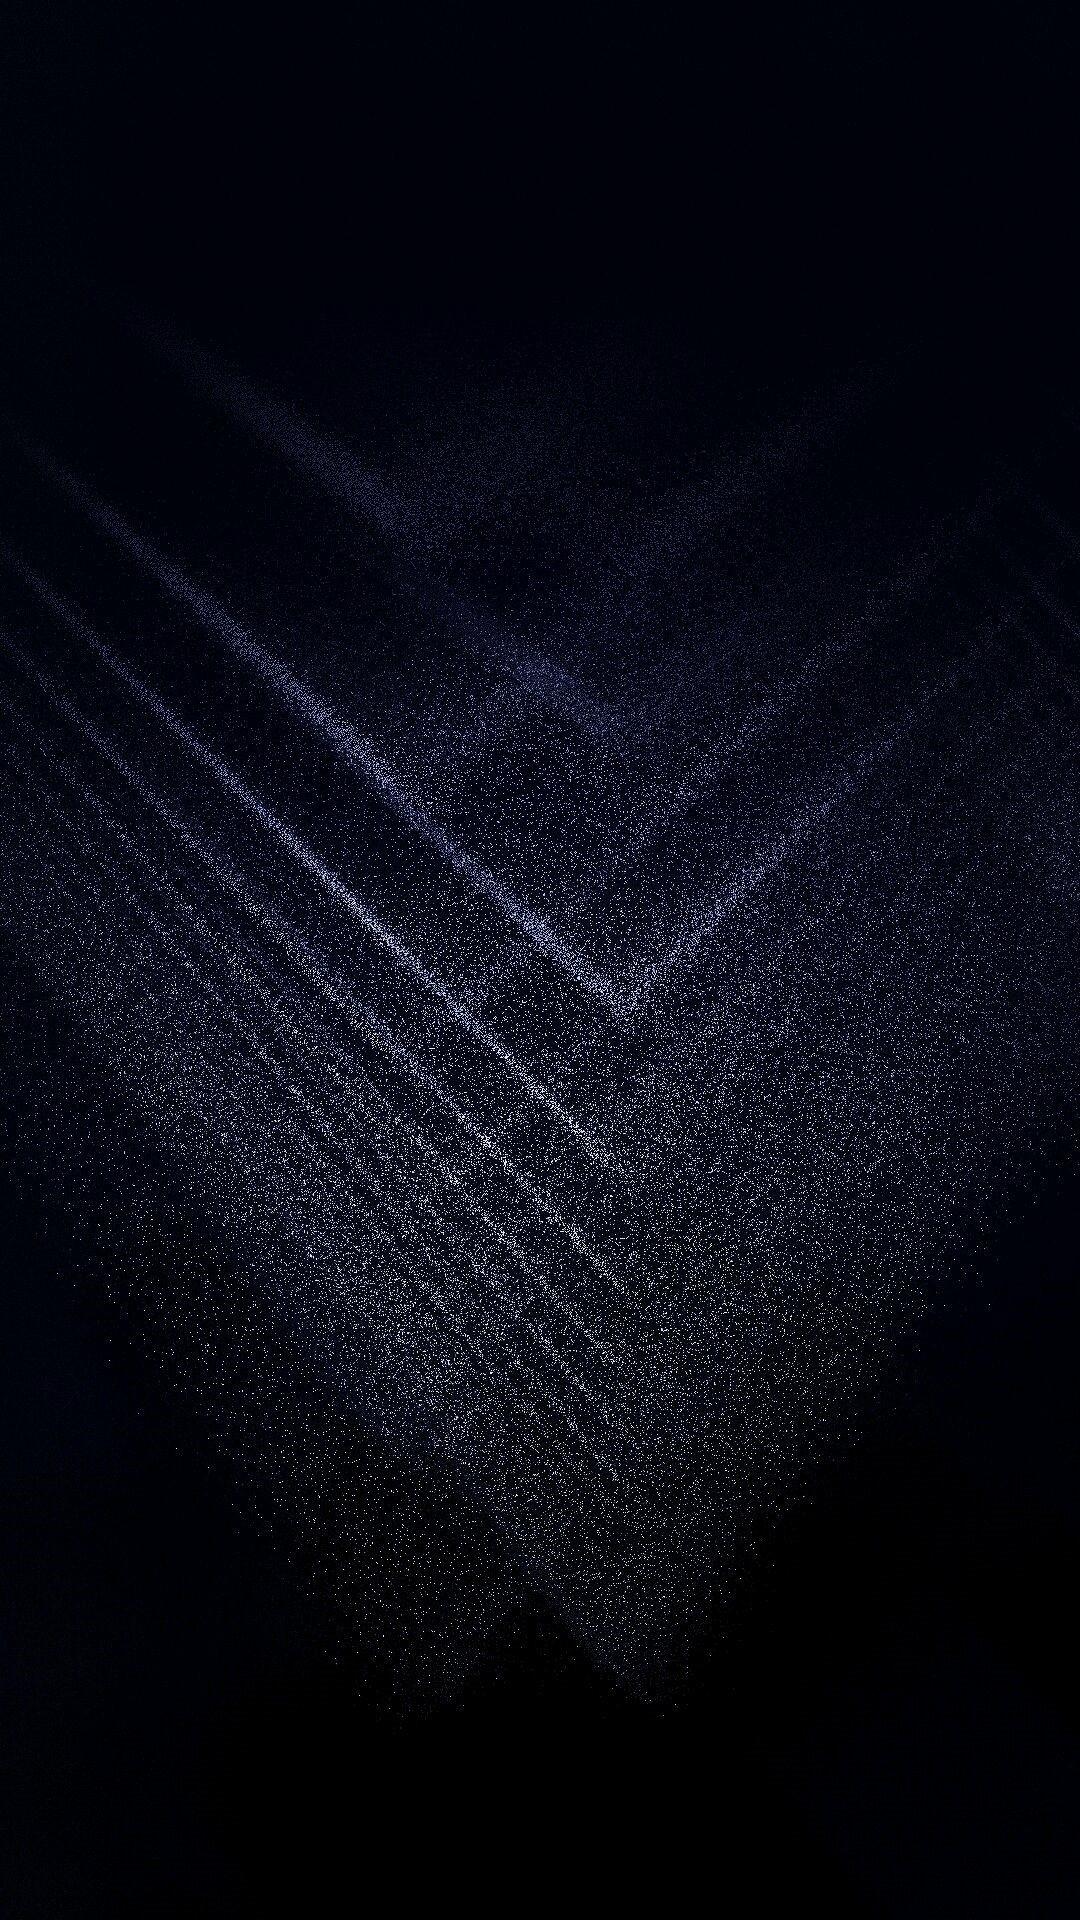 Dark phone wallpaper hd